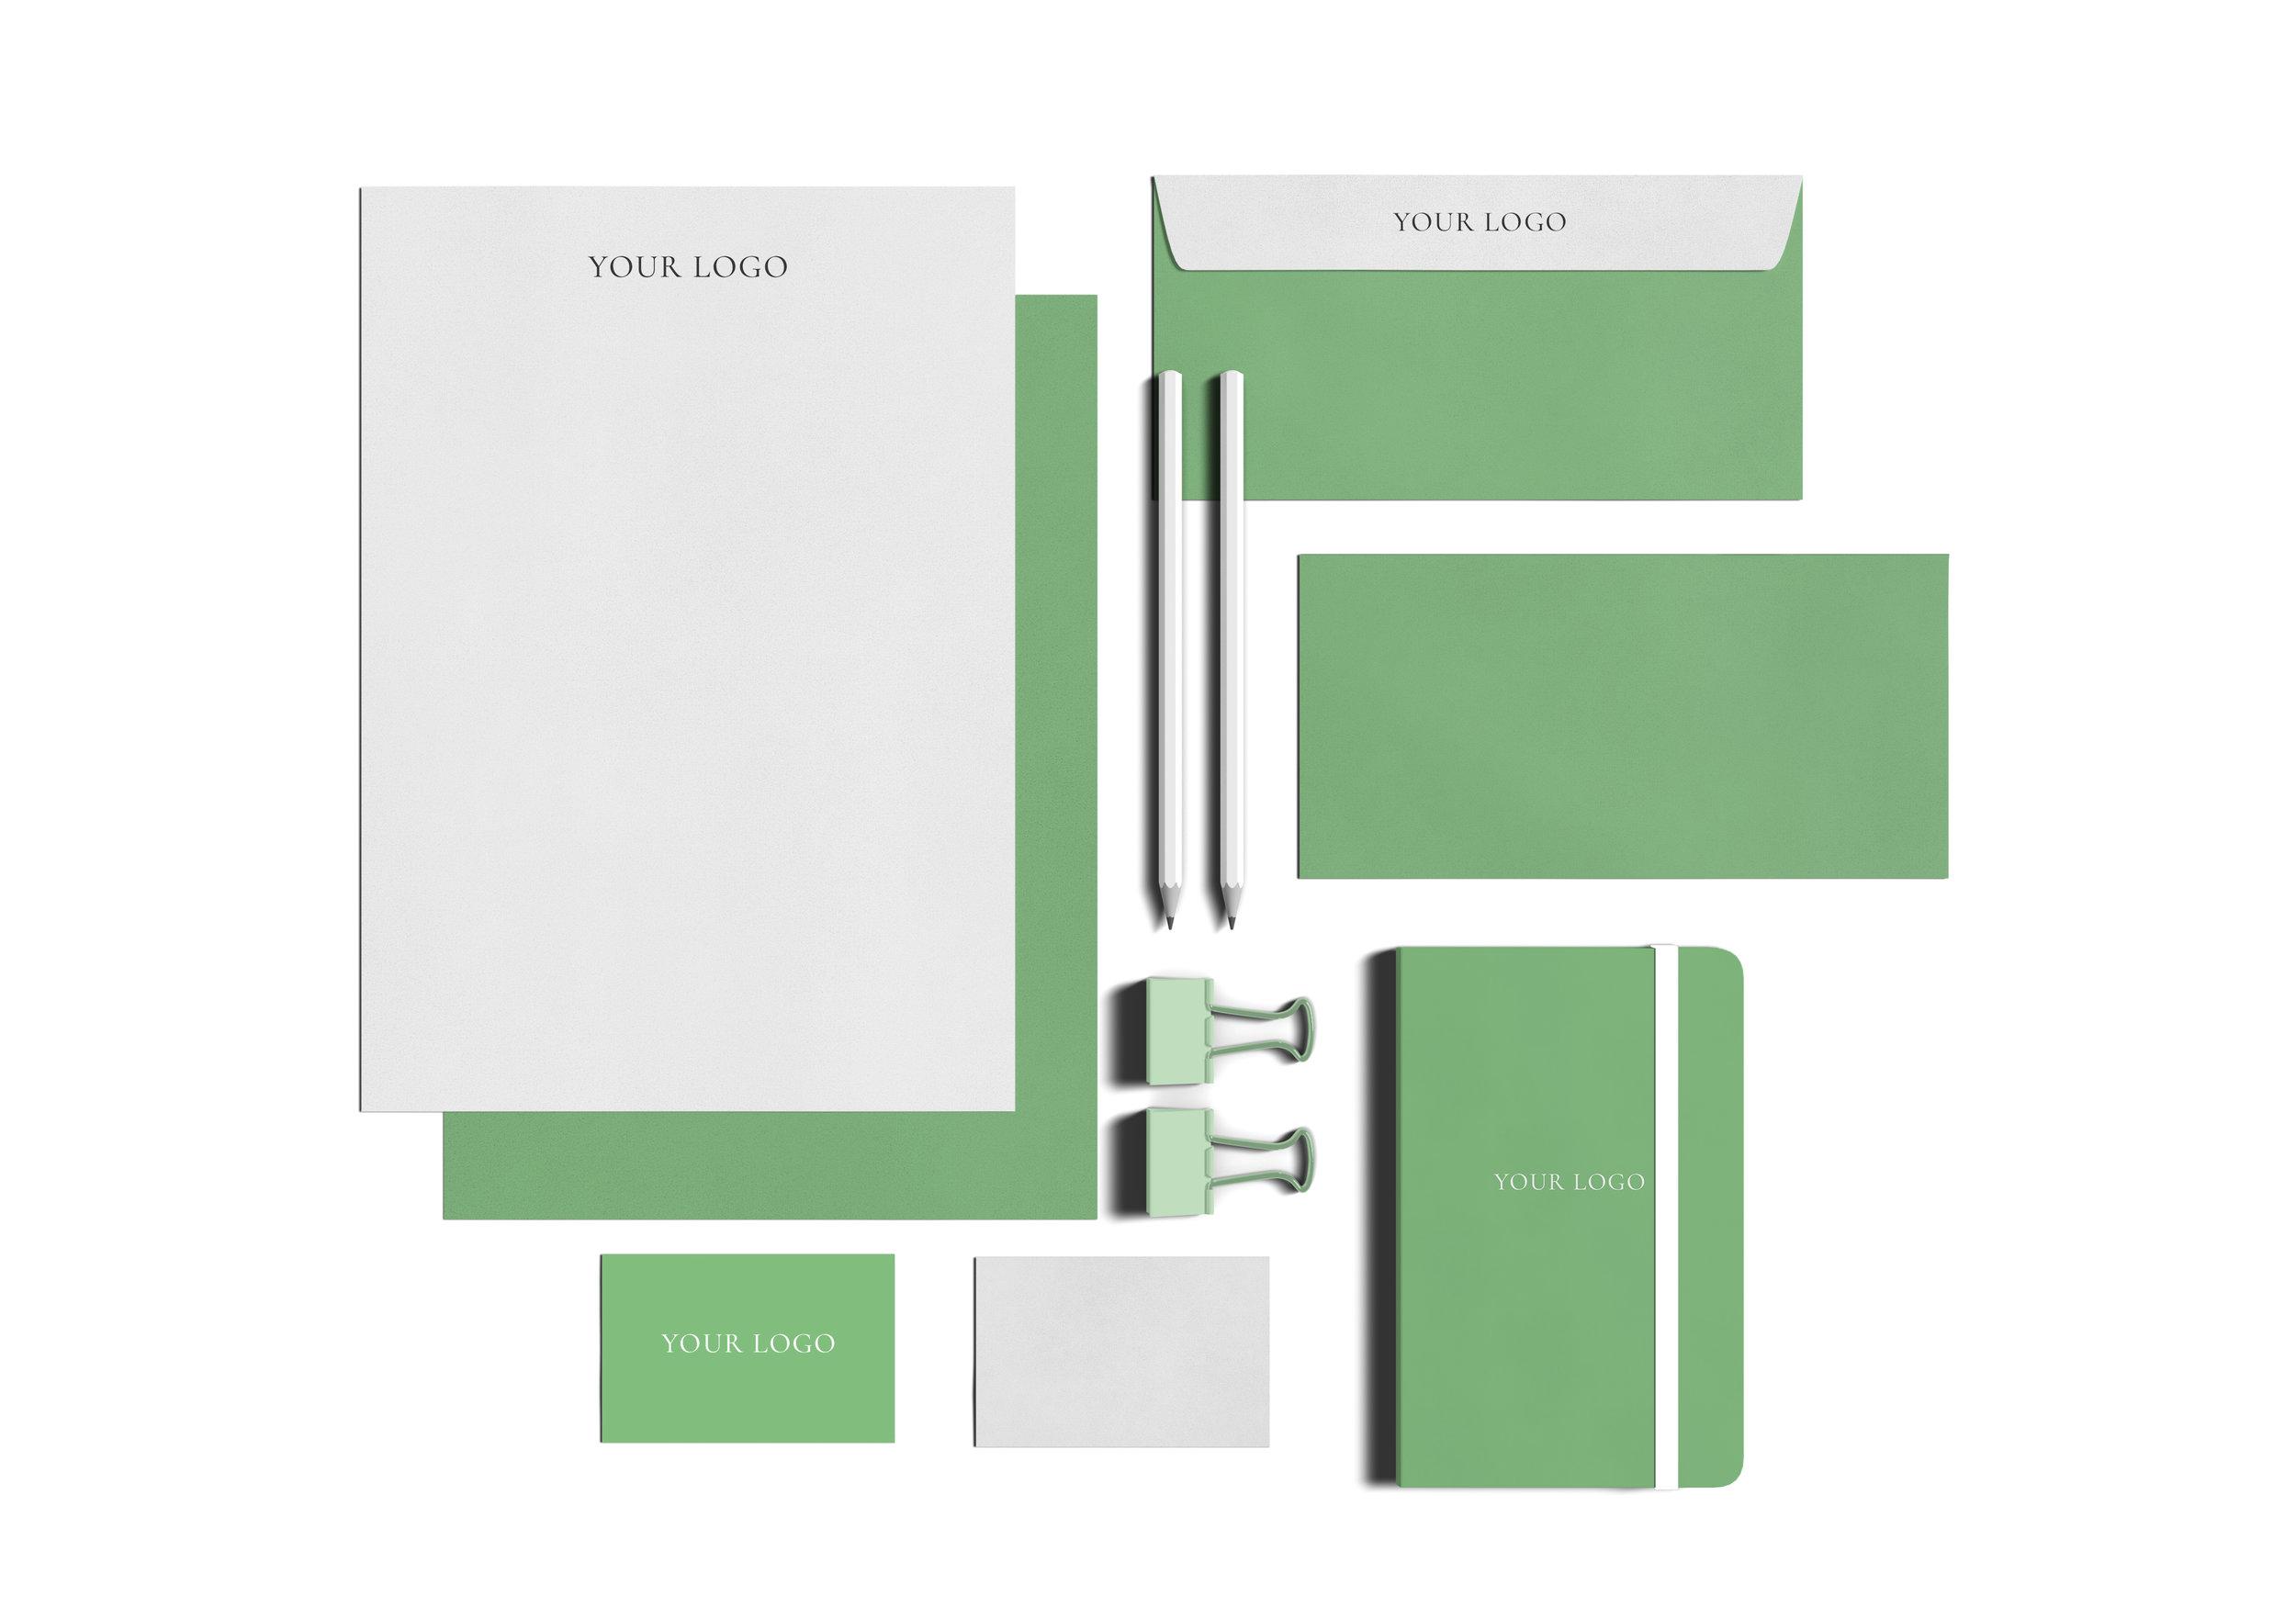 Brand consistency example by White Box Design Studio